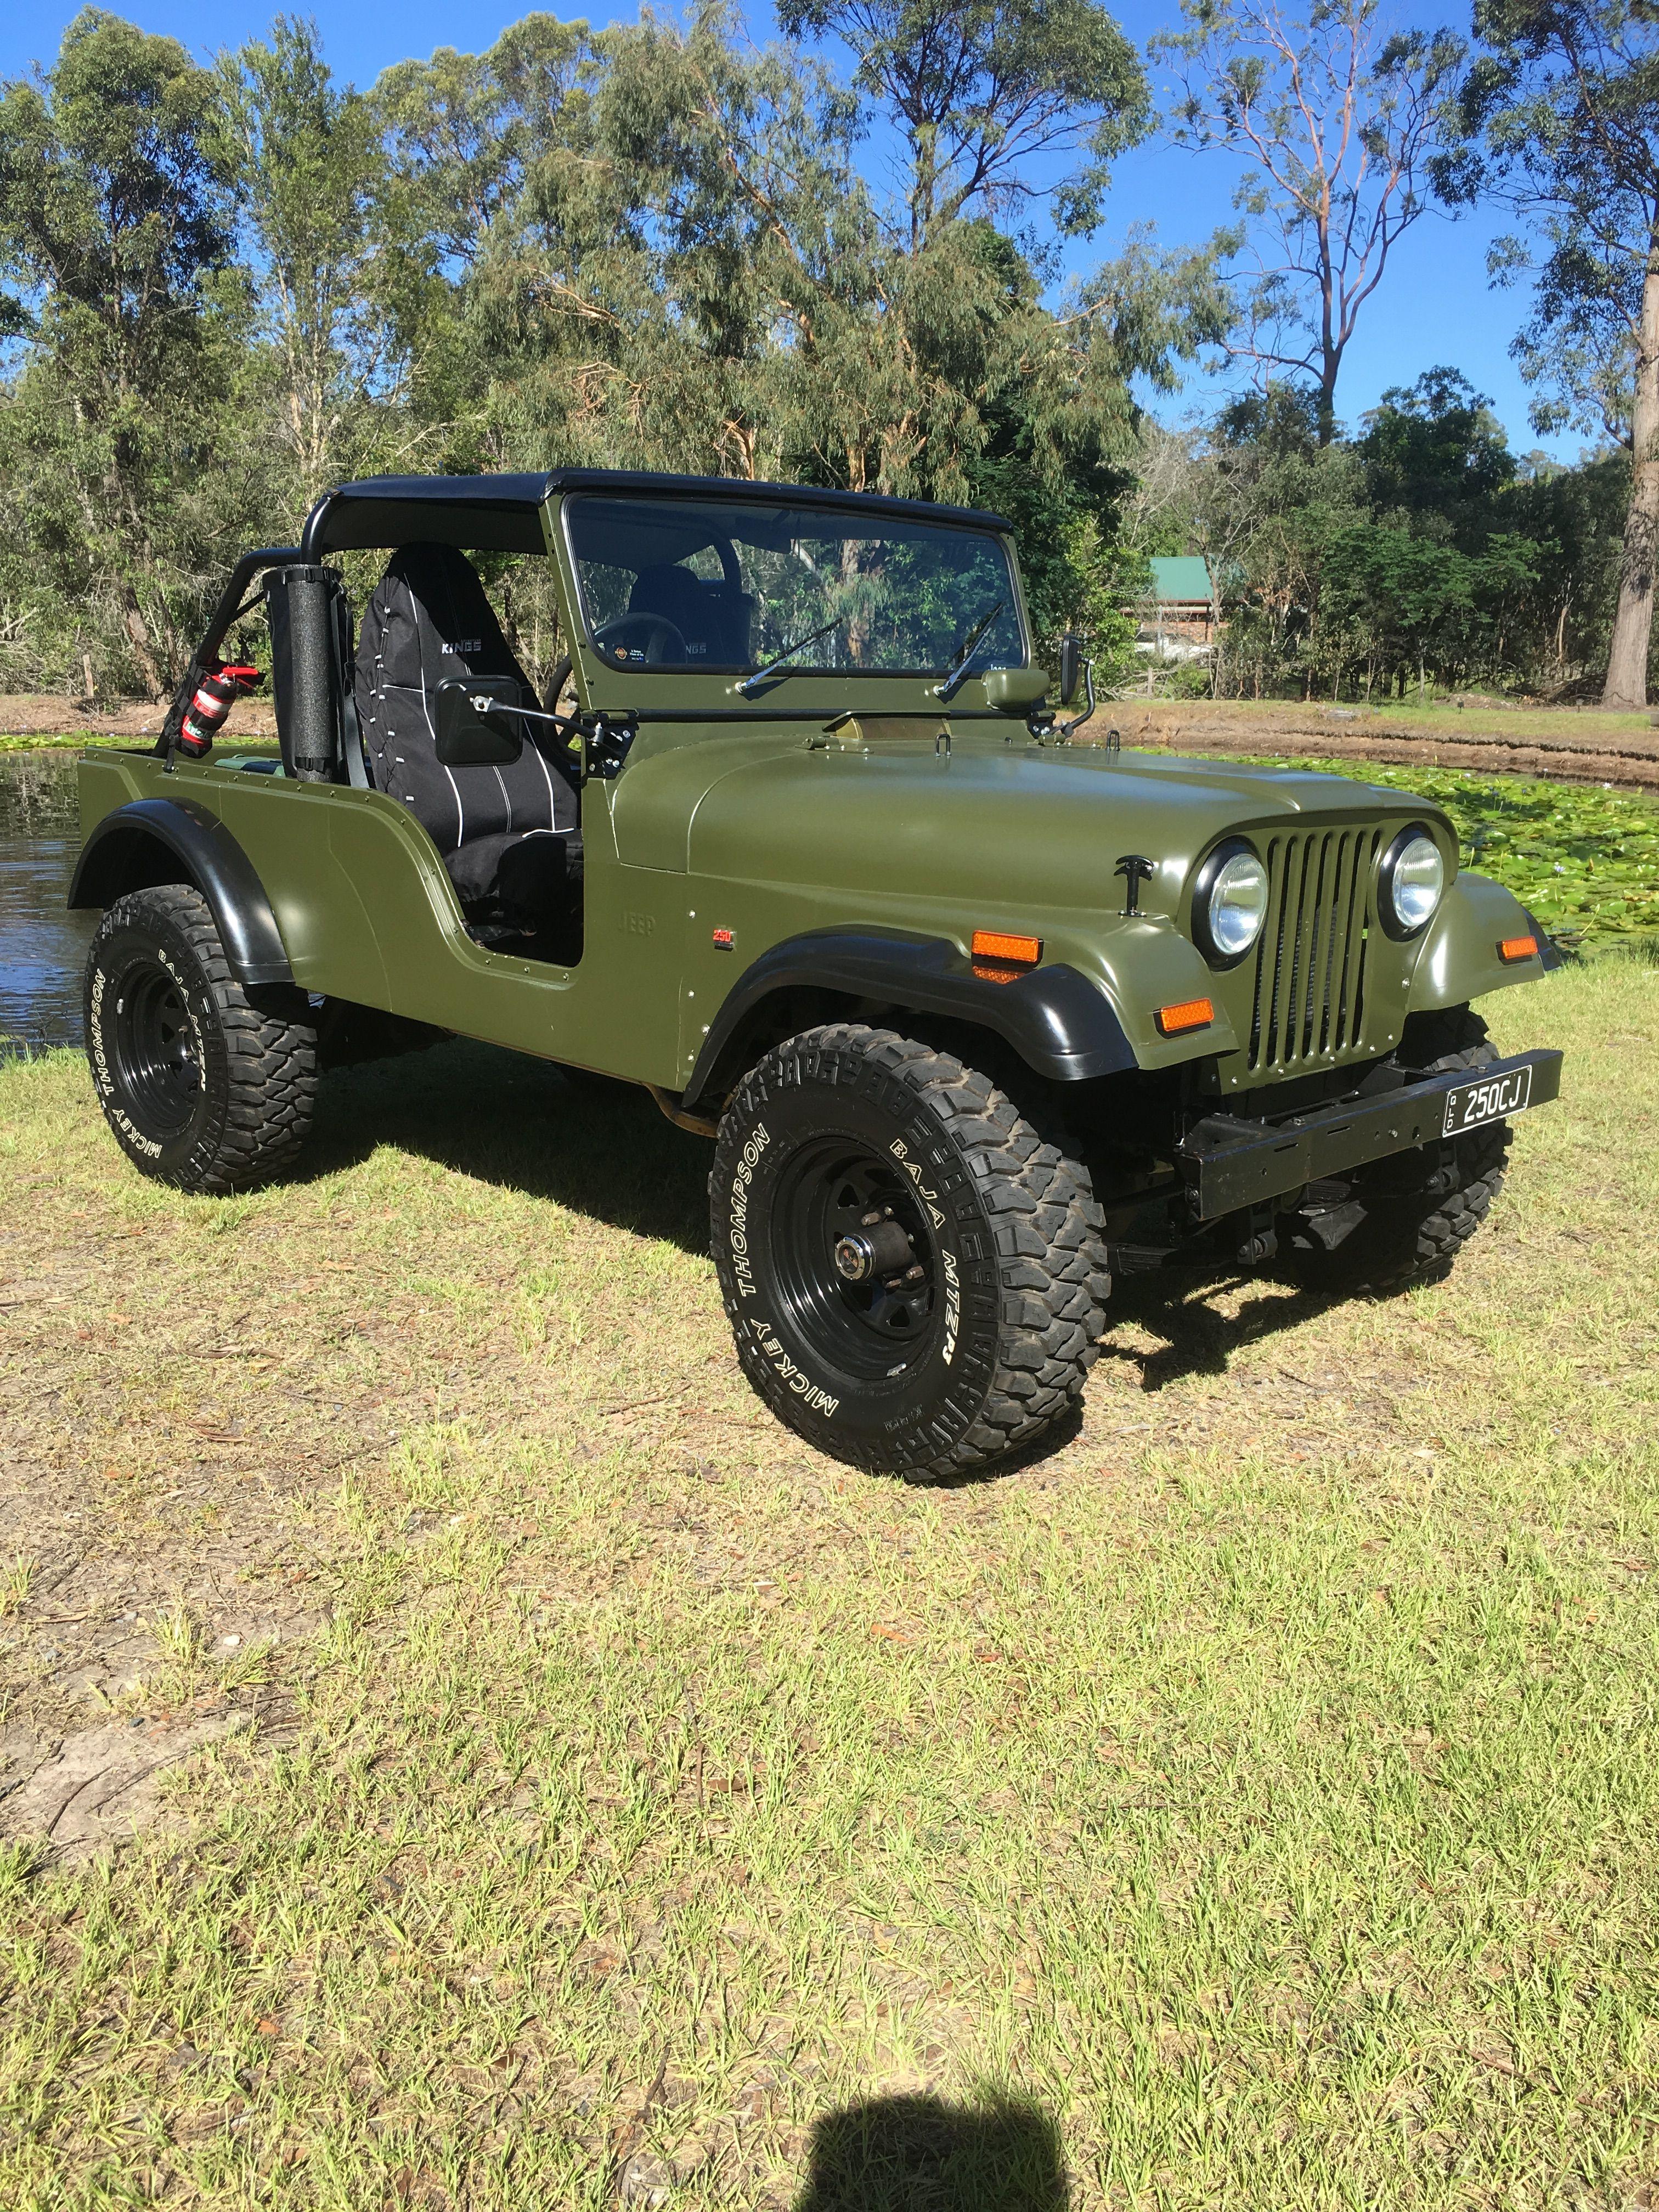 Pin By Tim Mannix On Willys Jeep Cj6 Jeep Cj5 Jeep Renegade